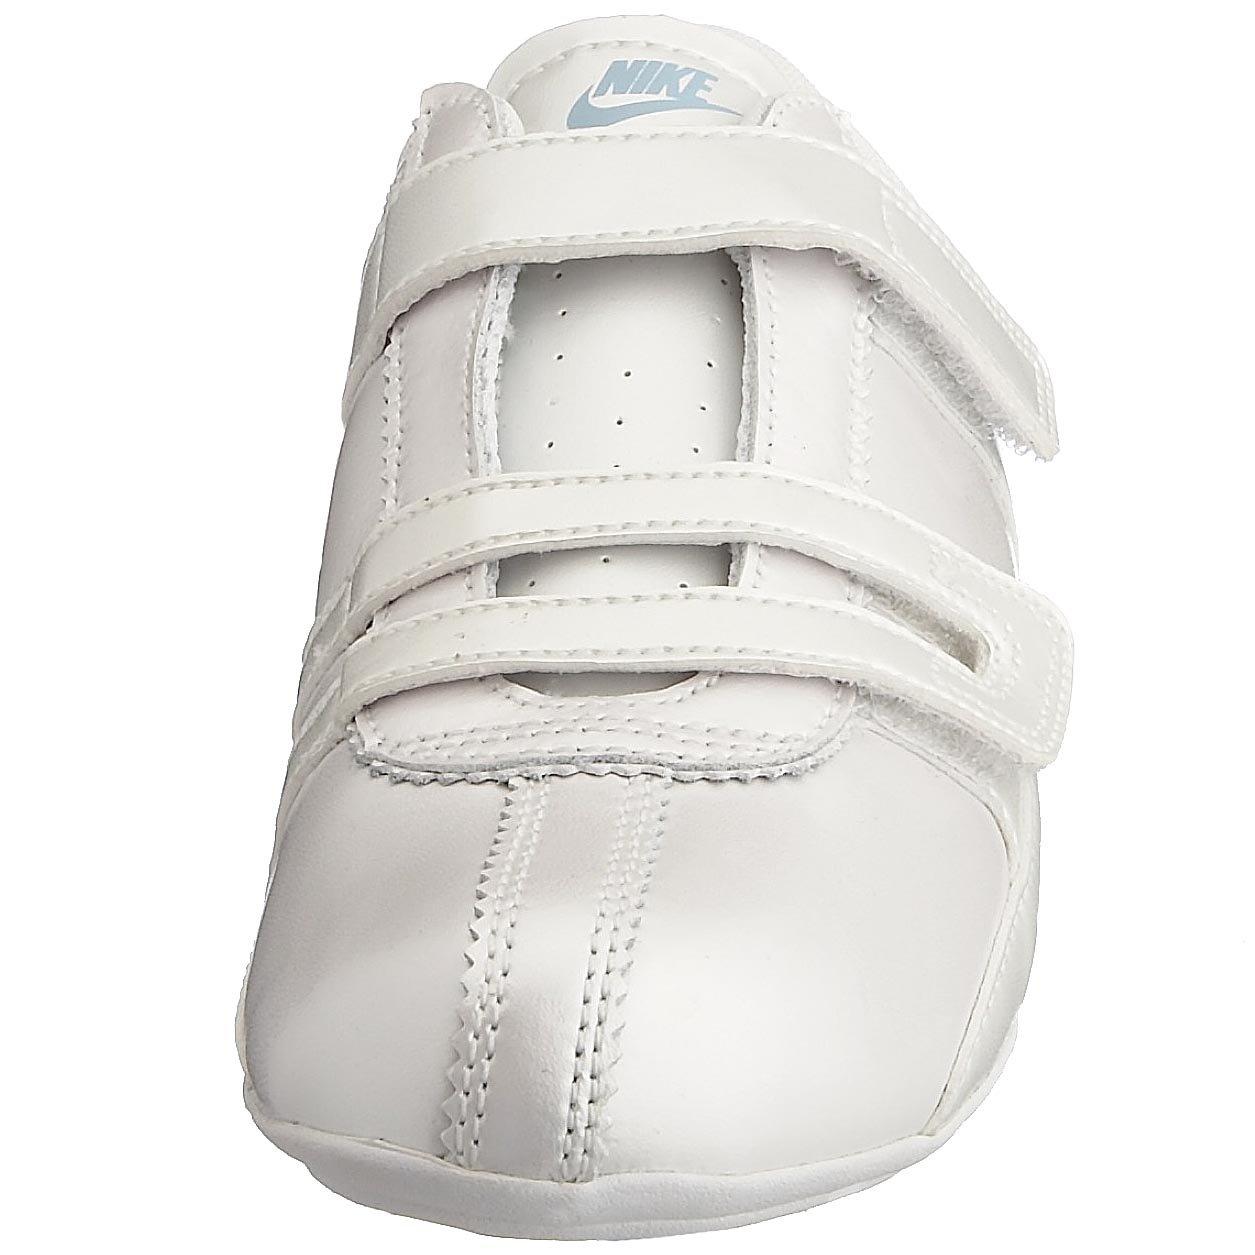 31493c22acd Nike Shox Rivalry V